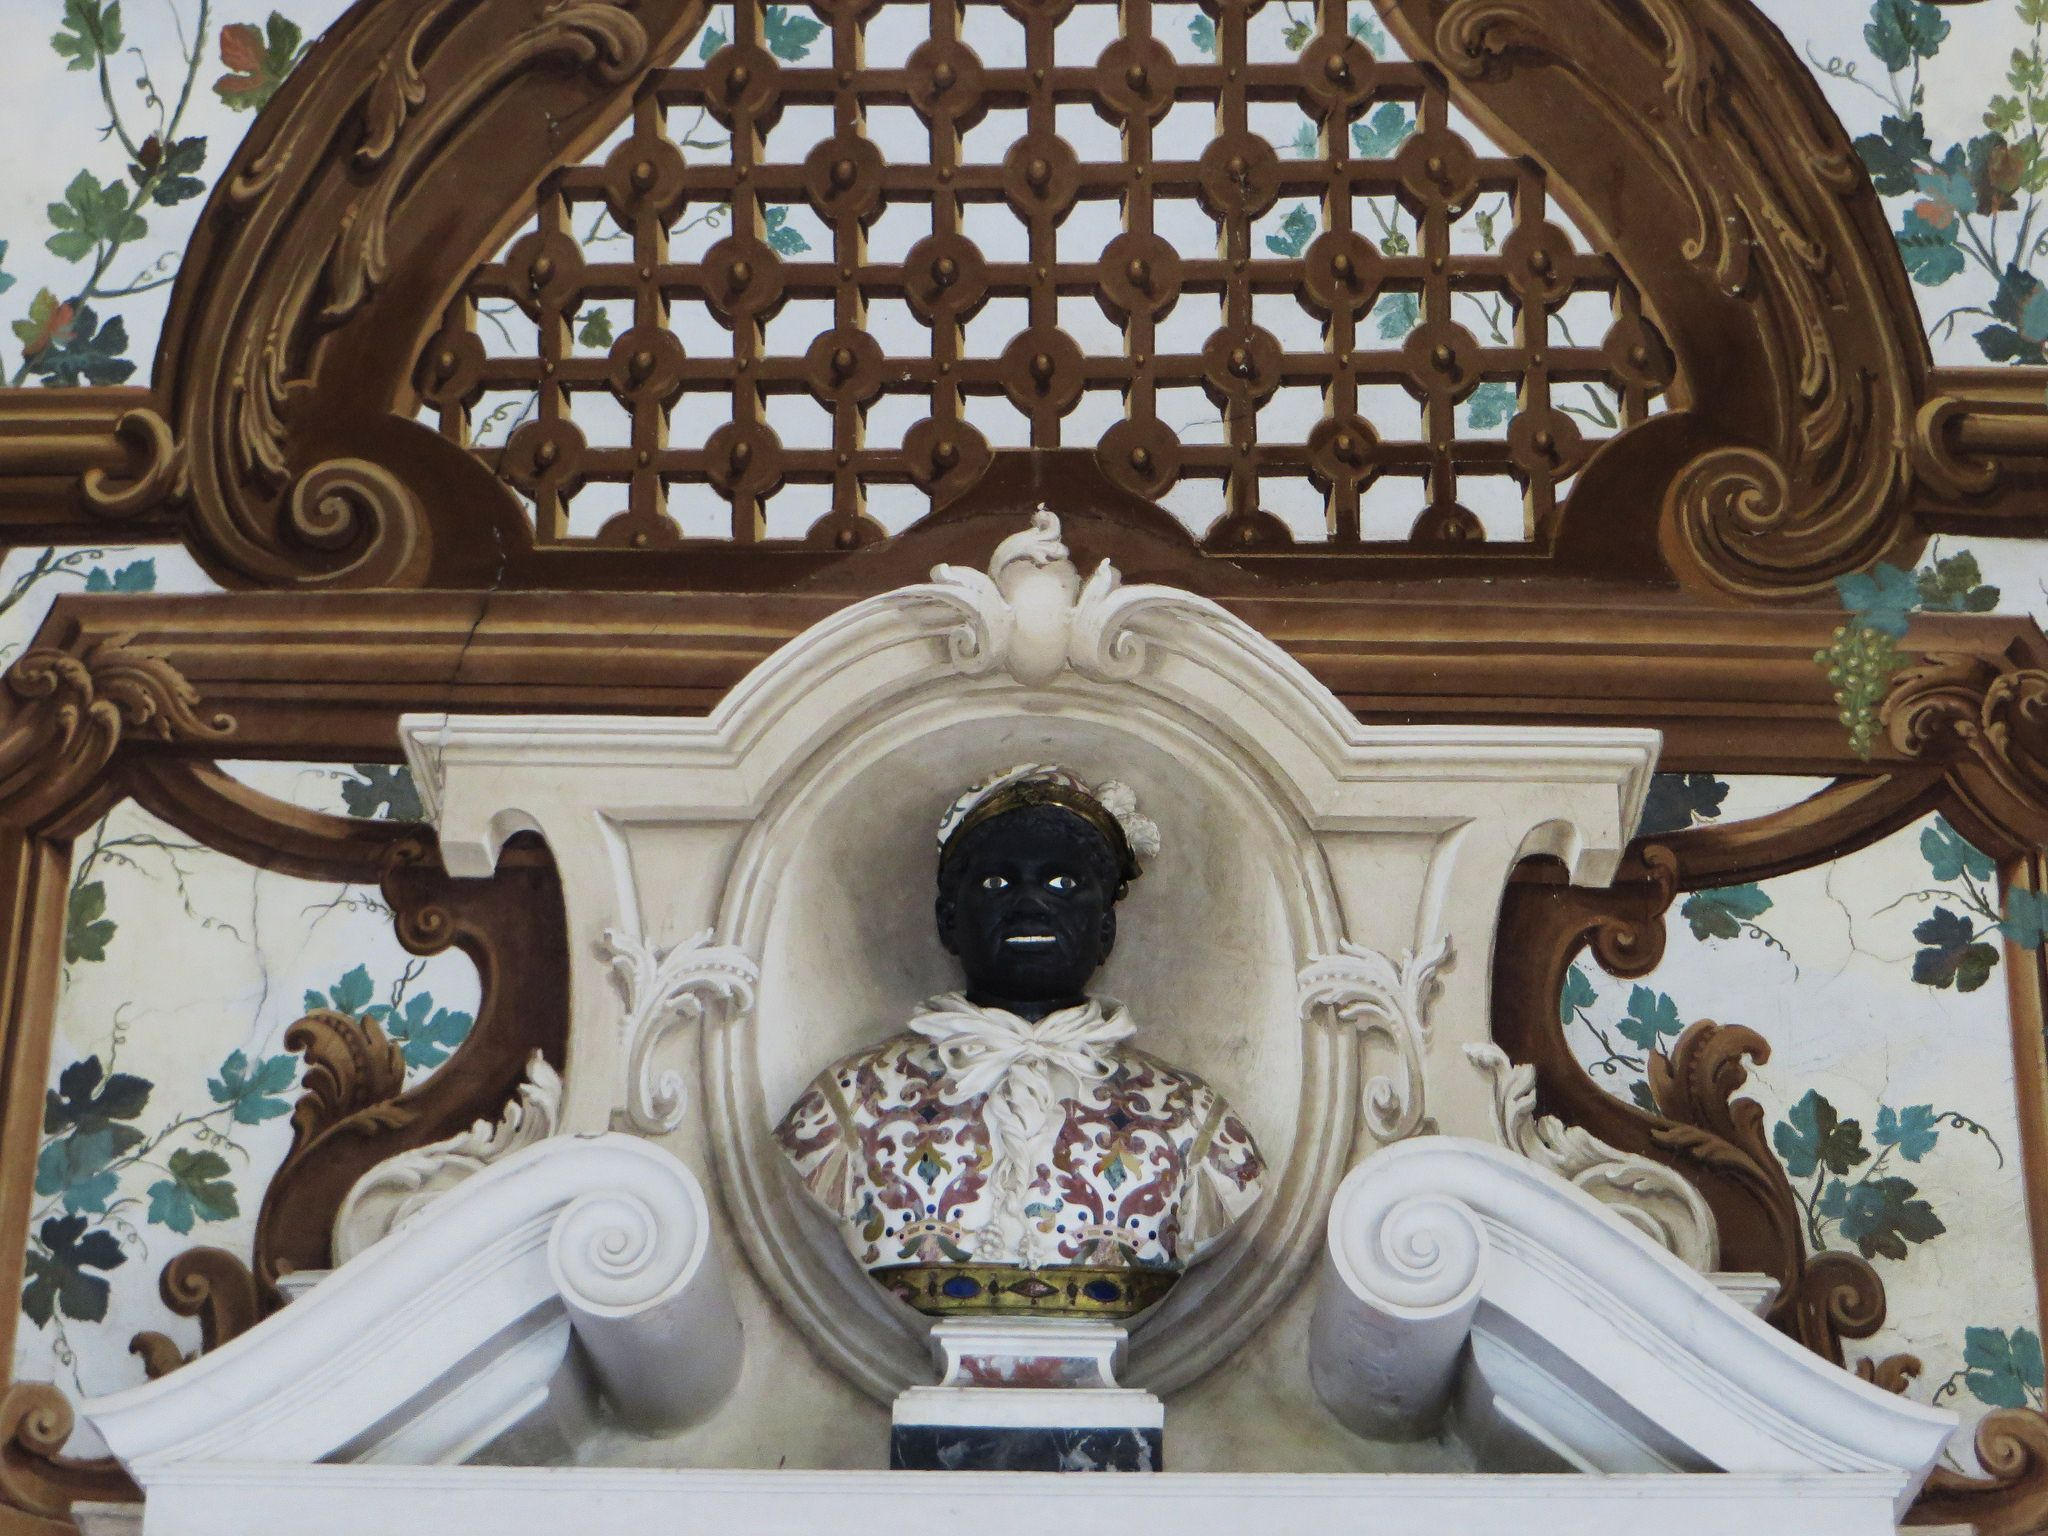 Dans le jardin suspendu, Palais ducal, Mantoue, province de Mantoue, Lombardie, Italie.